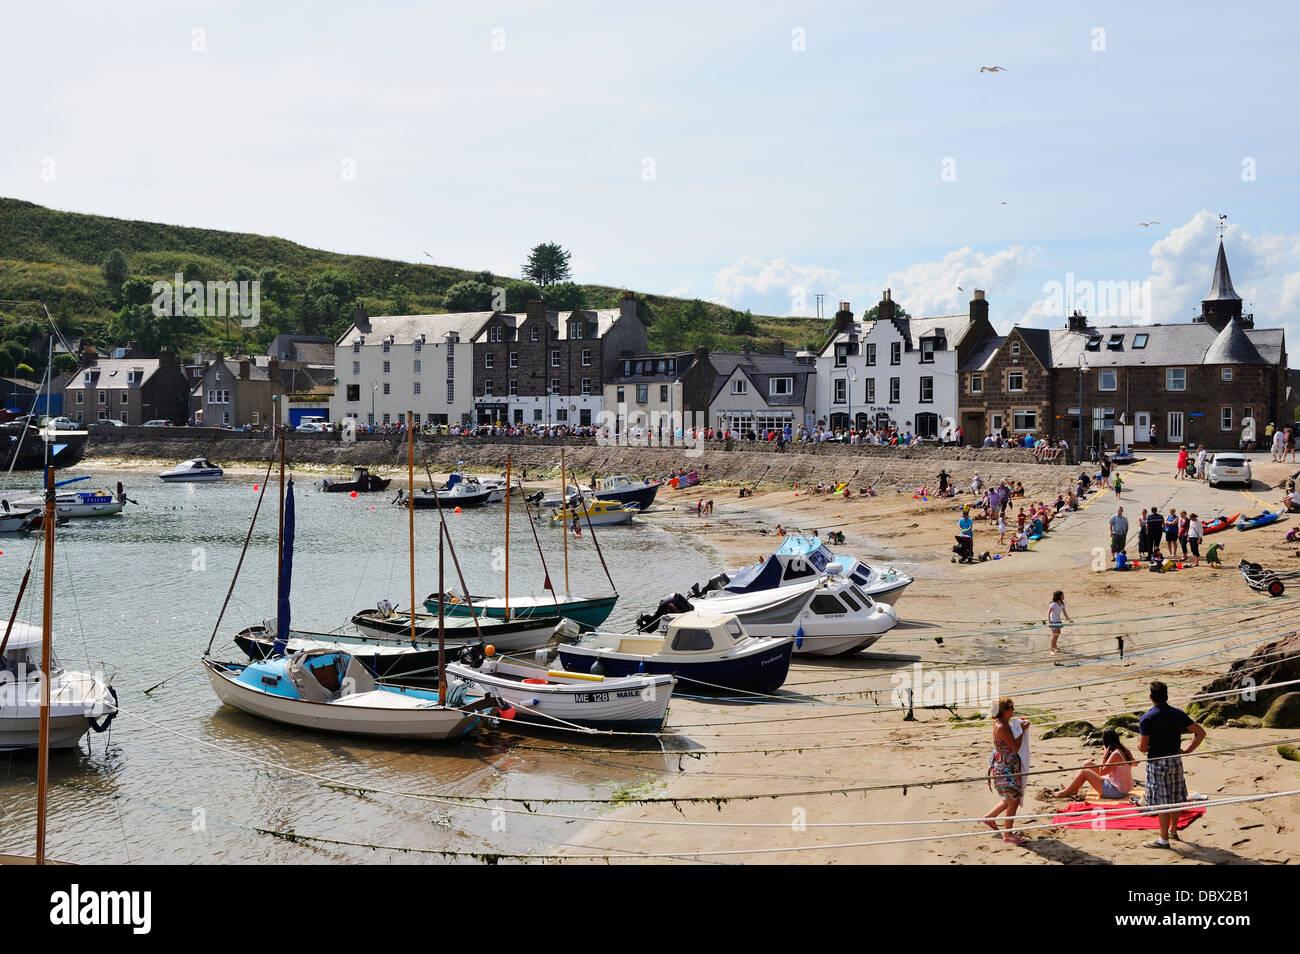 Stonehaven harbour, Aberdeenshire, Scotland - Stock Image